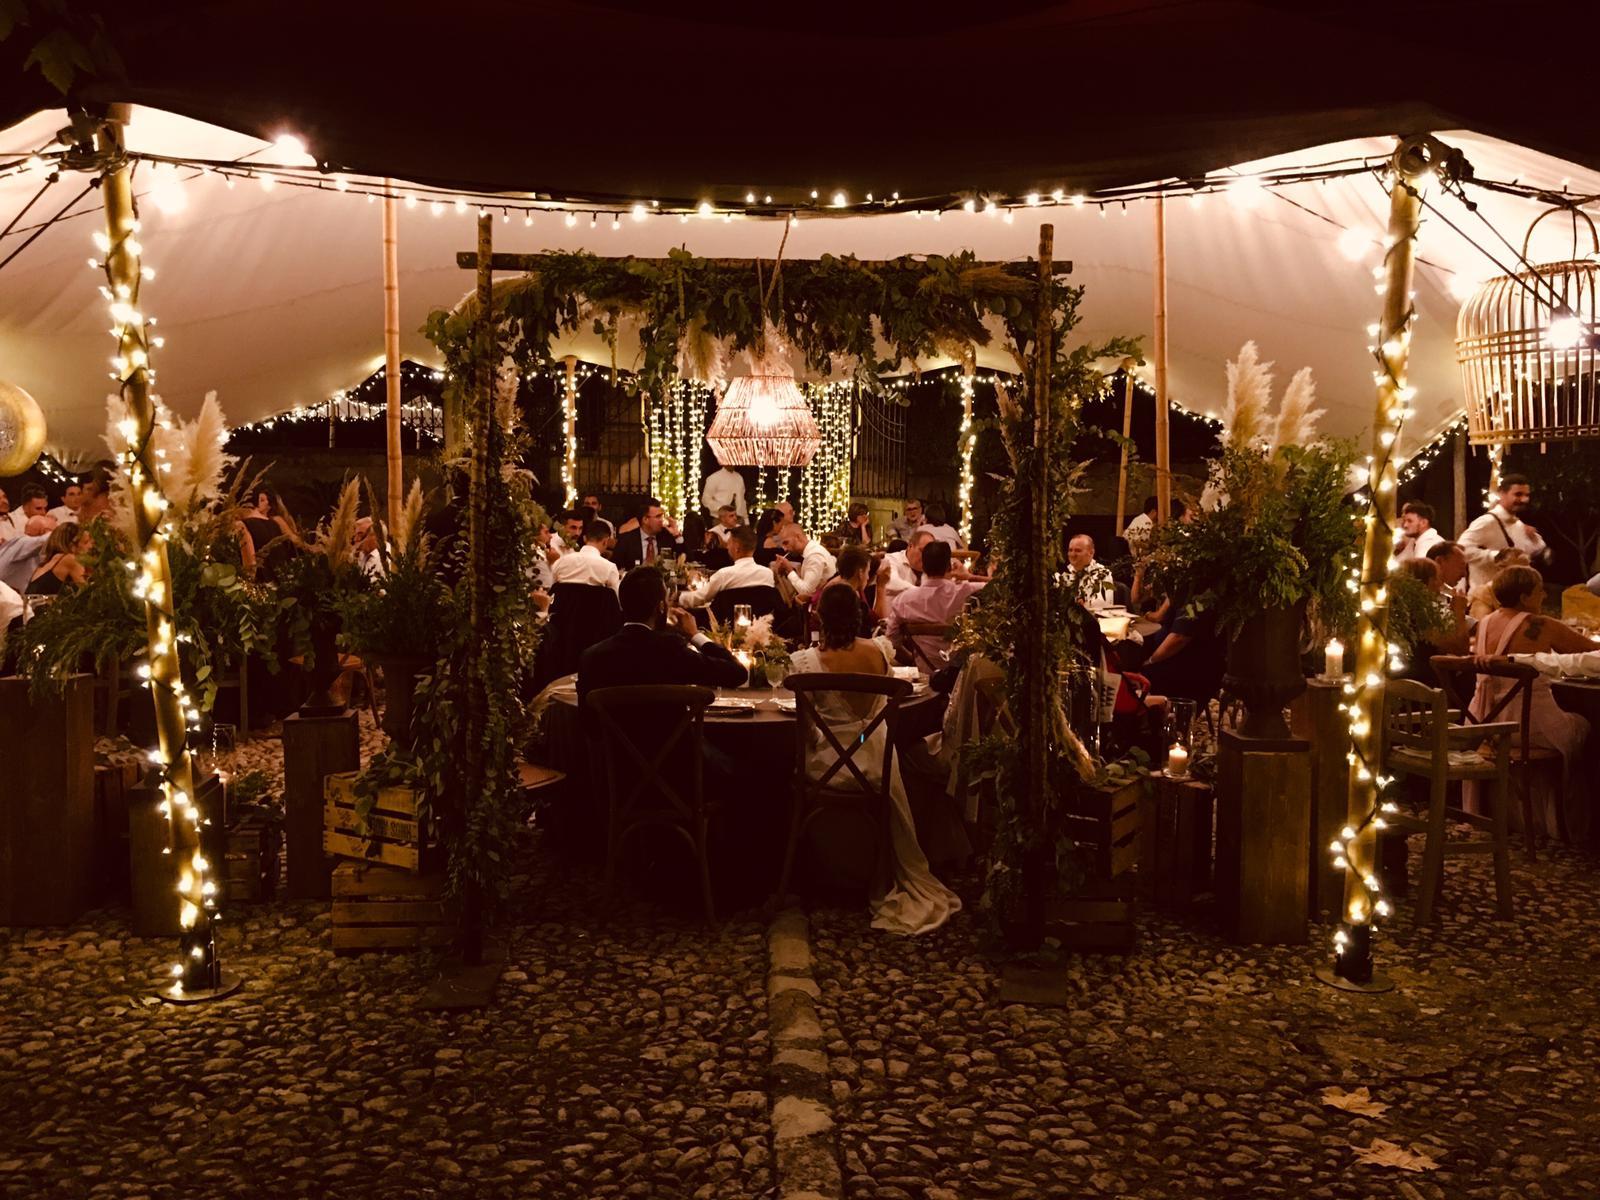 alquiler-iluminacion-evento-boda-mallorca-grupo-tot-a-punt-catering-rentals